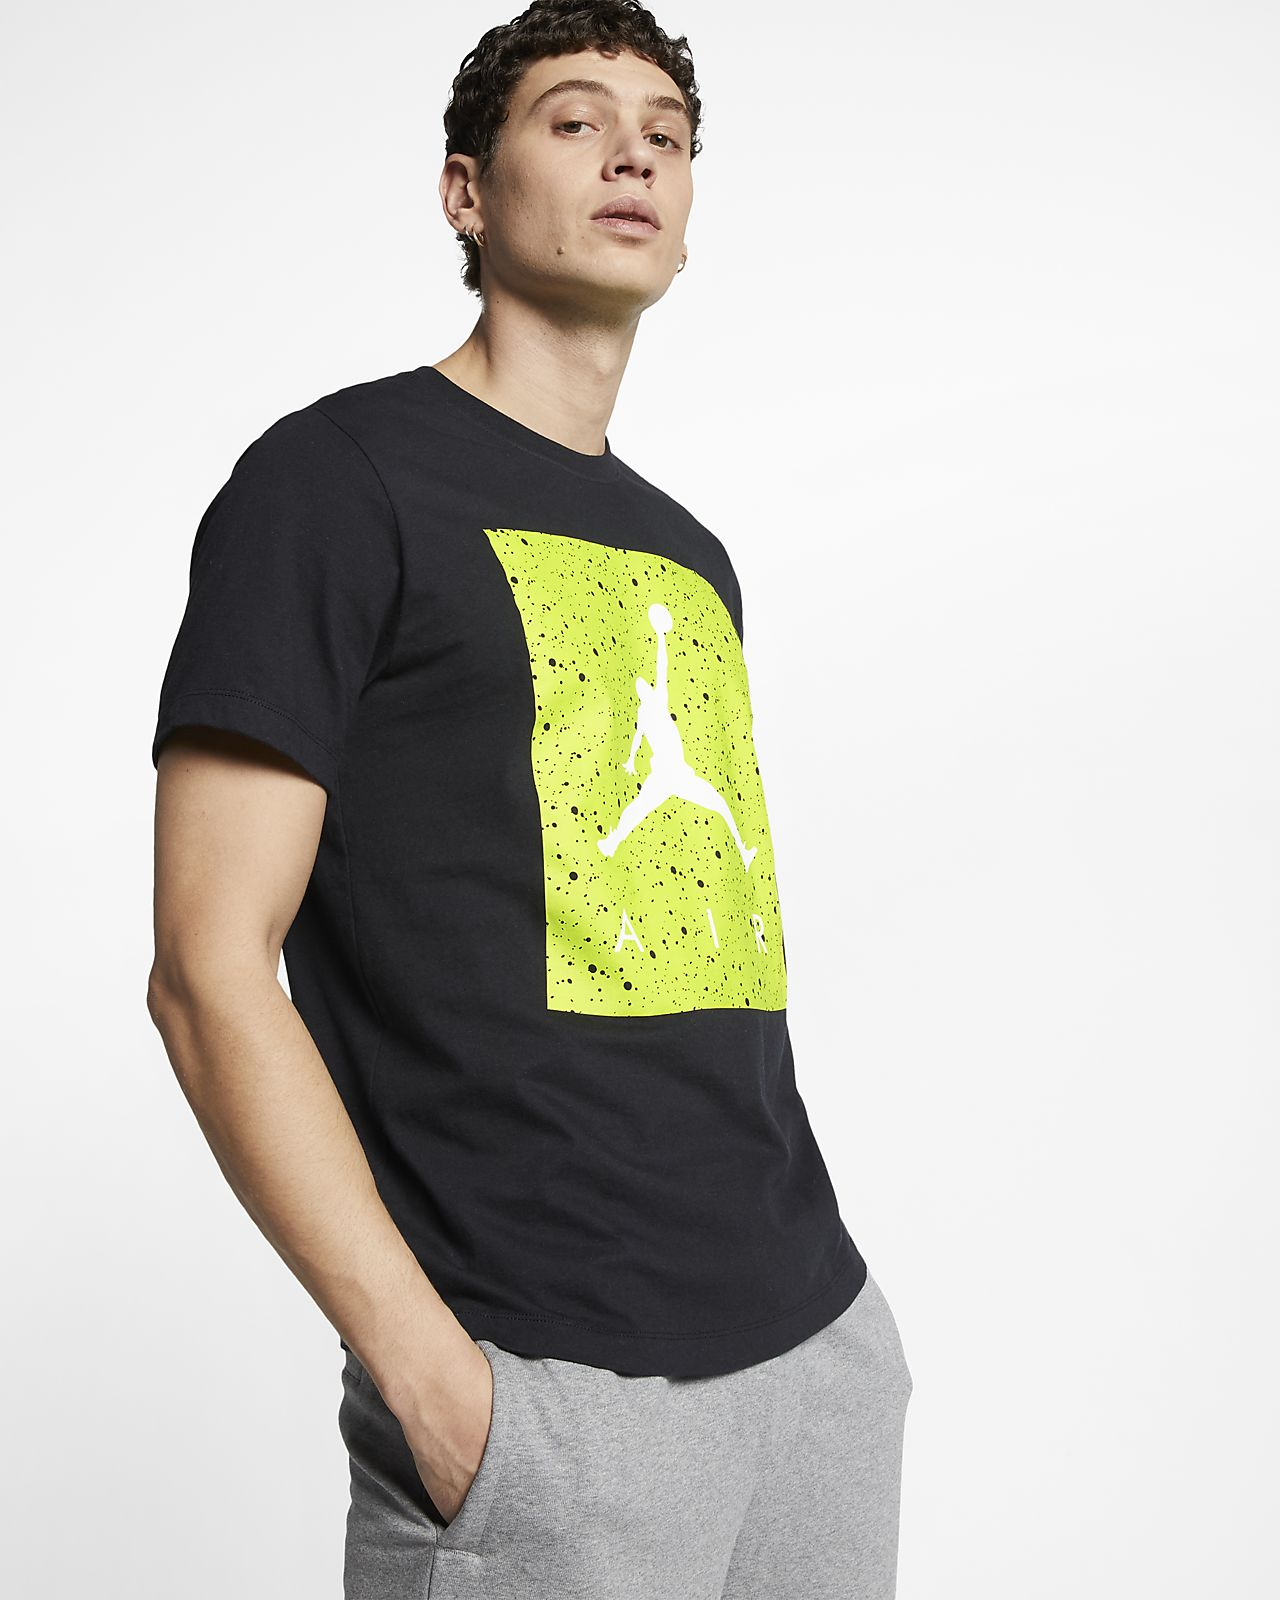 da9cd7489 Jordan Poolside Men's T-Shirt. Nike.com